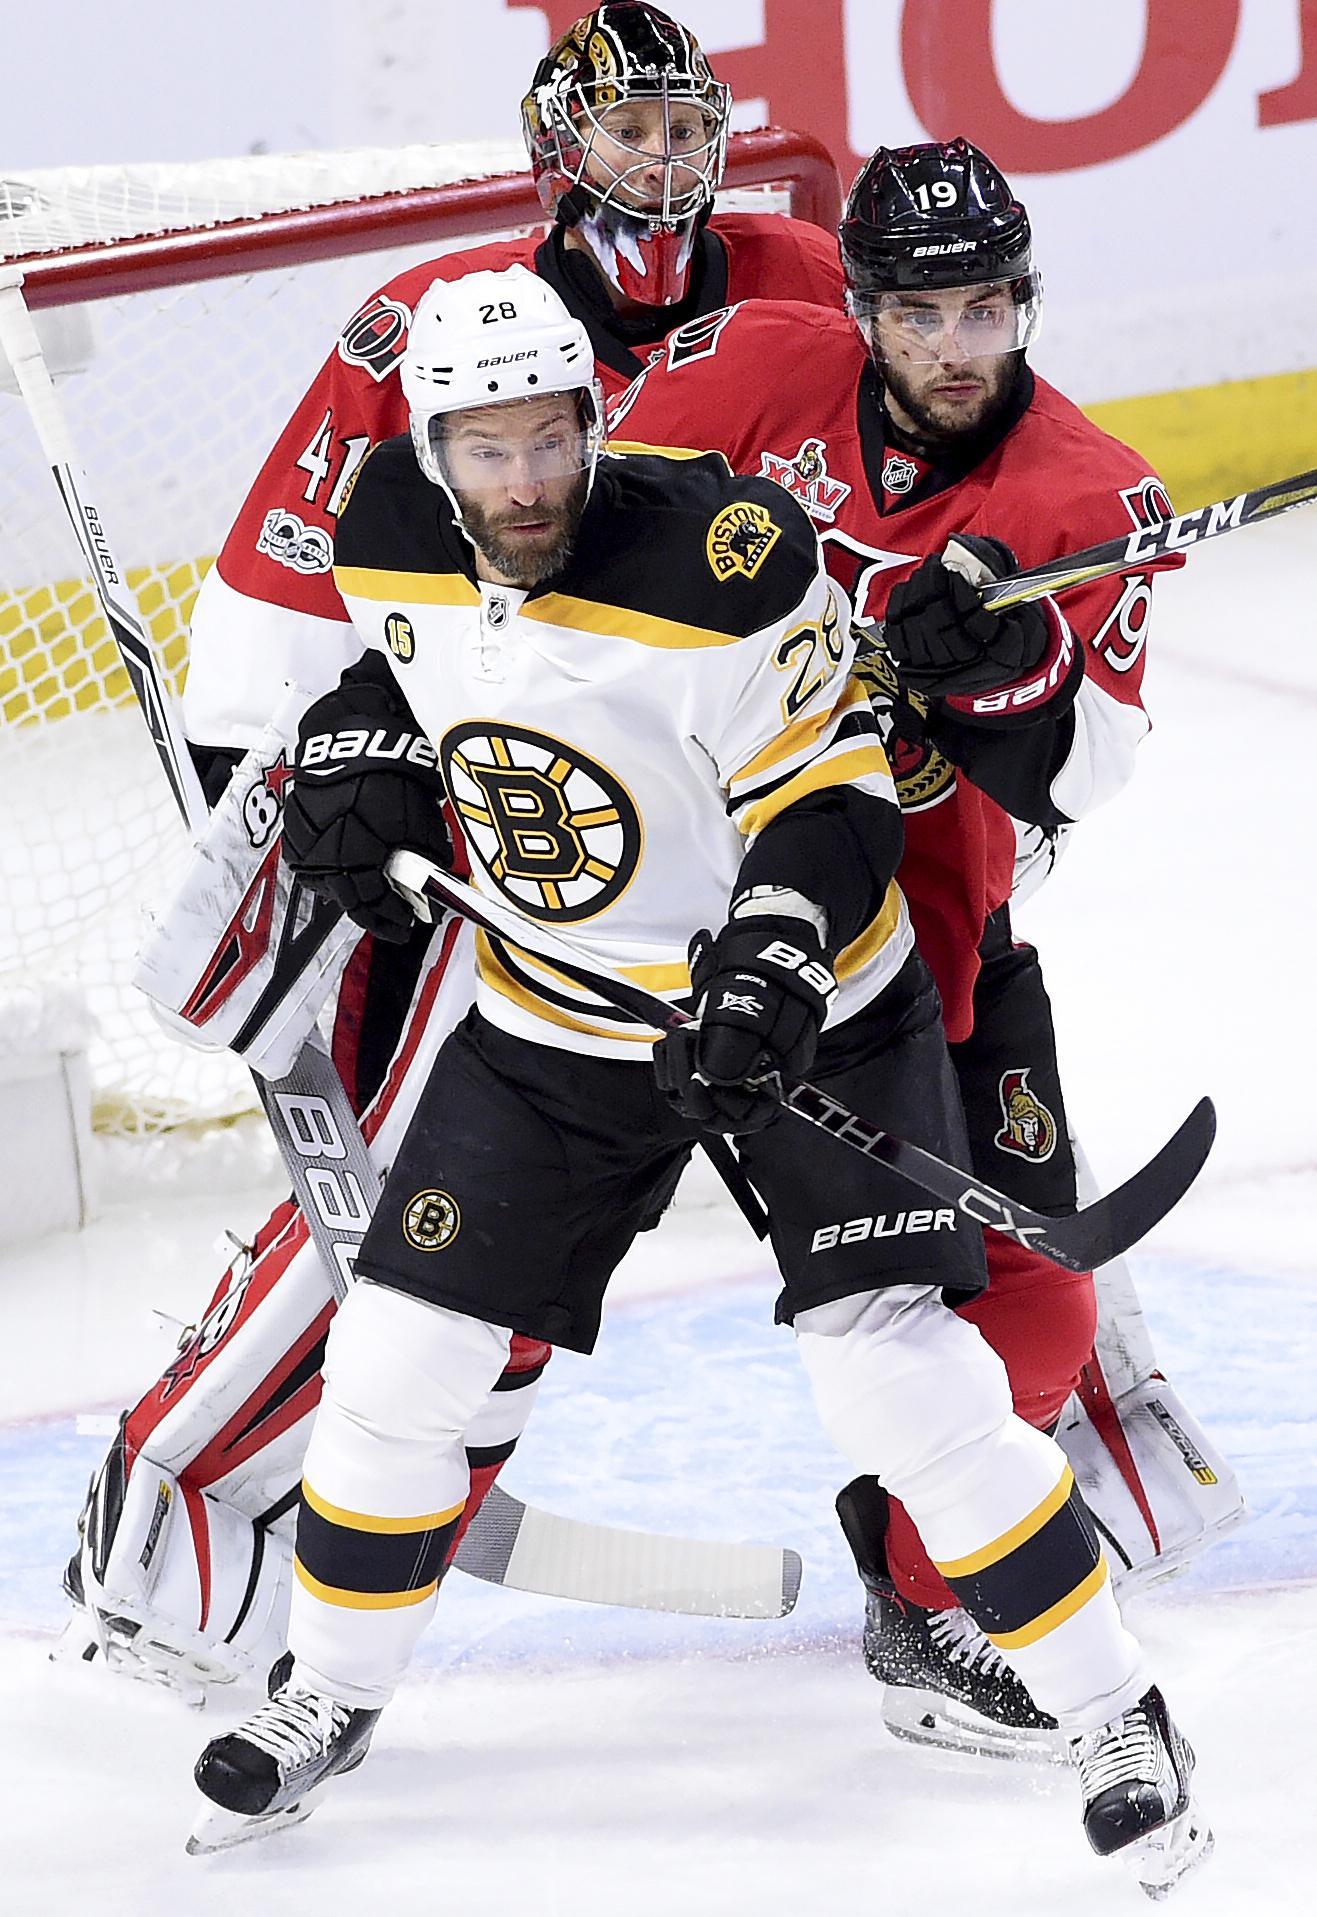 Screened_shots_hockey_54893